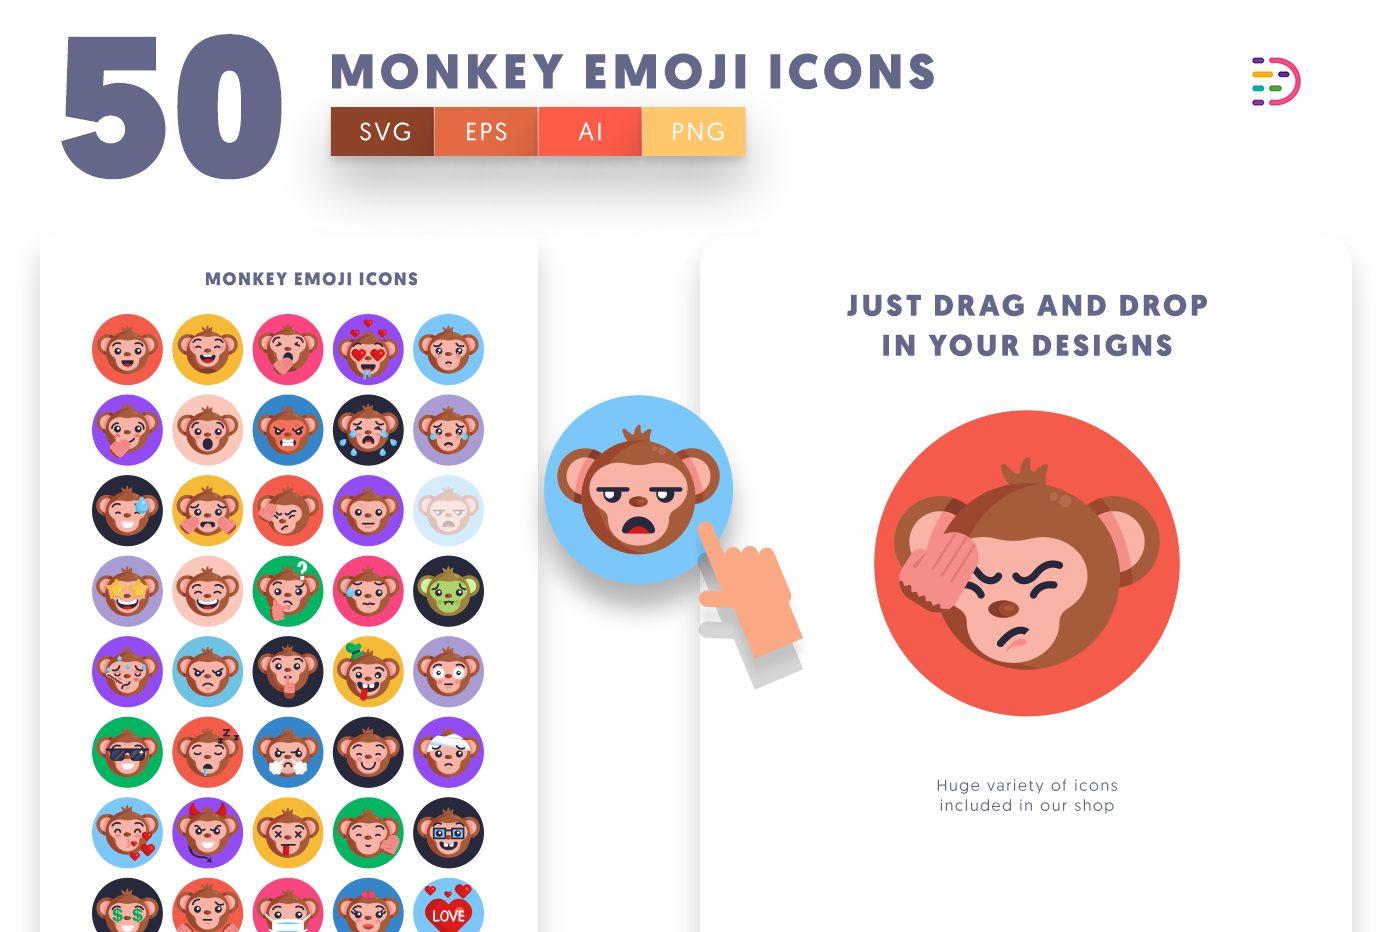 Drag and drop vector 50 Monkey Emoji Icons